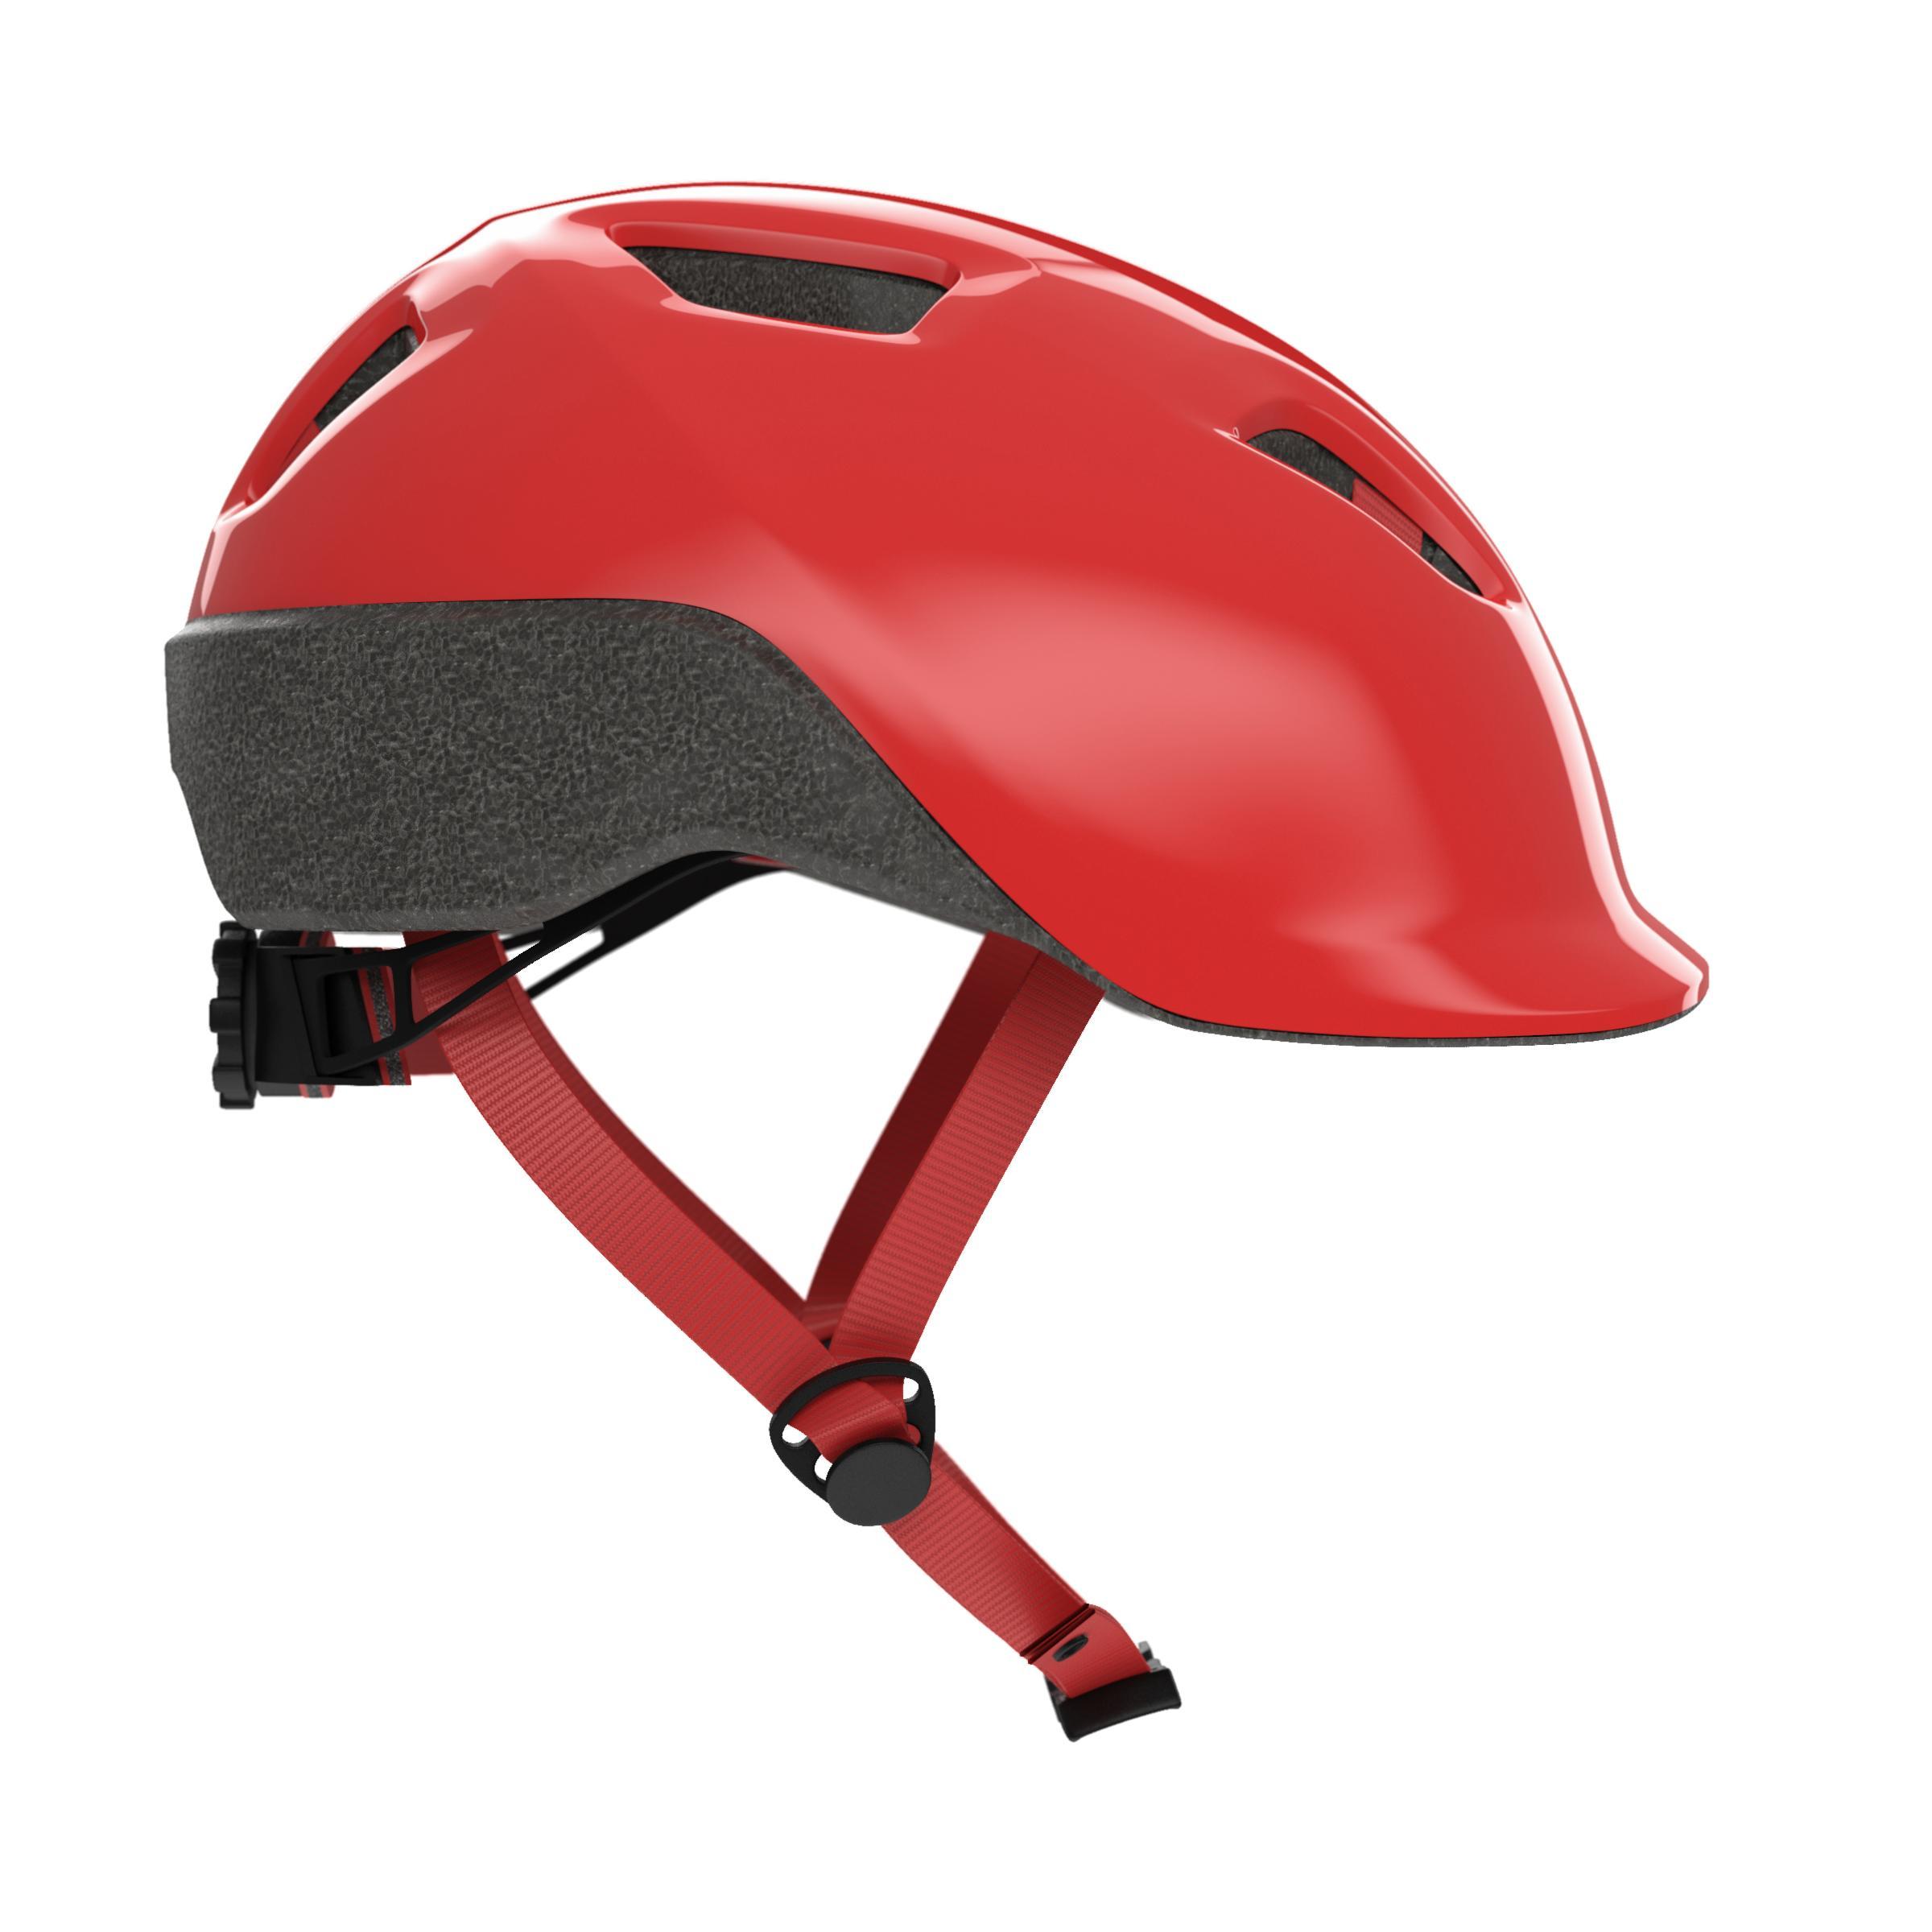 500 Kids' Cycling Helmet - Red